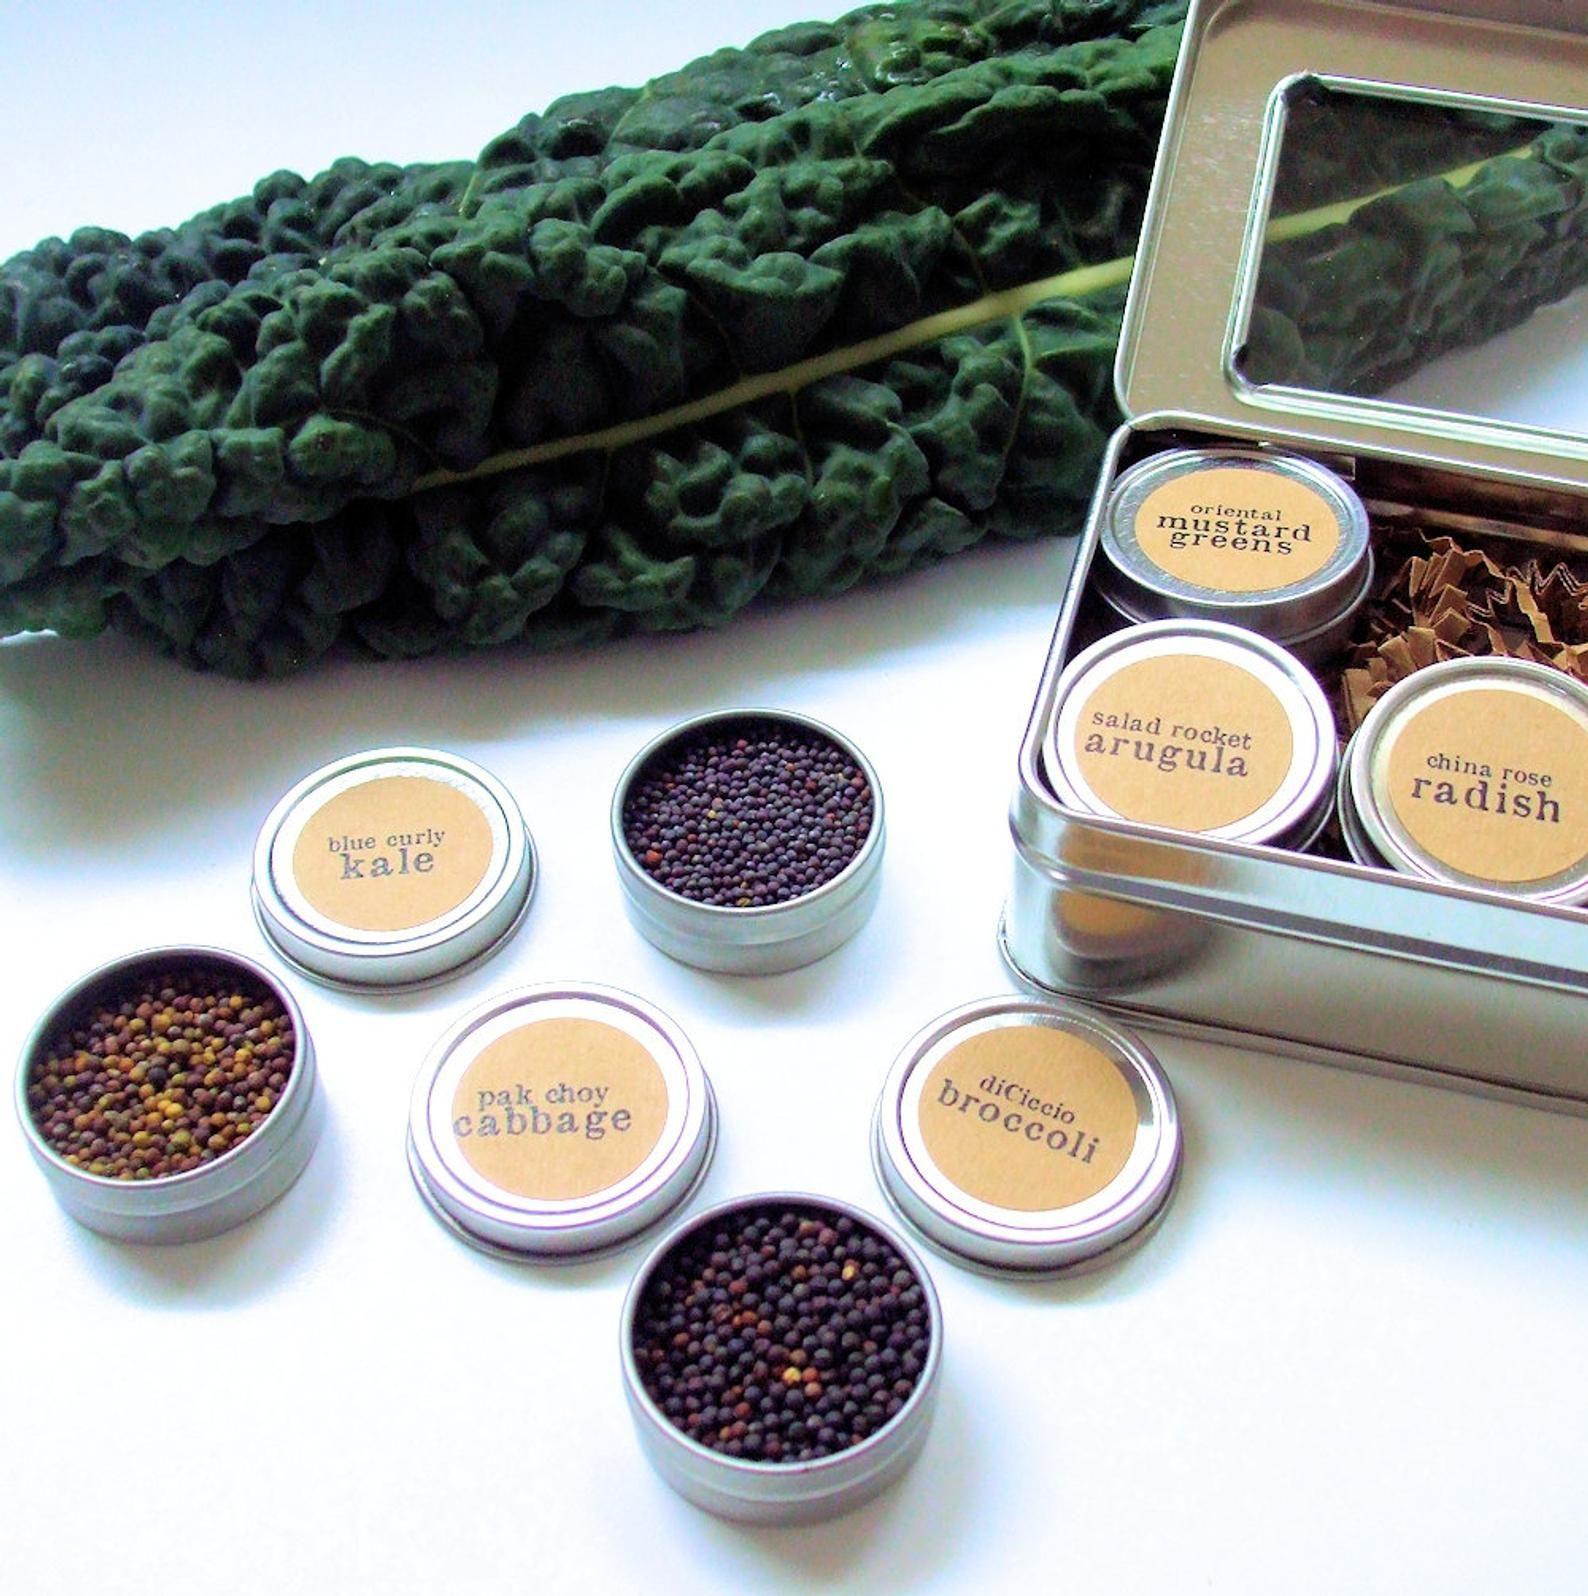 Diy microgreens brassicas seed kit indoor garden organic